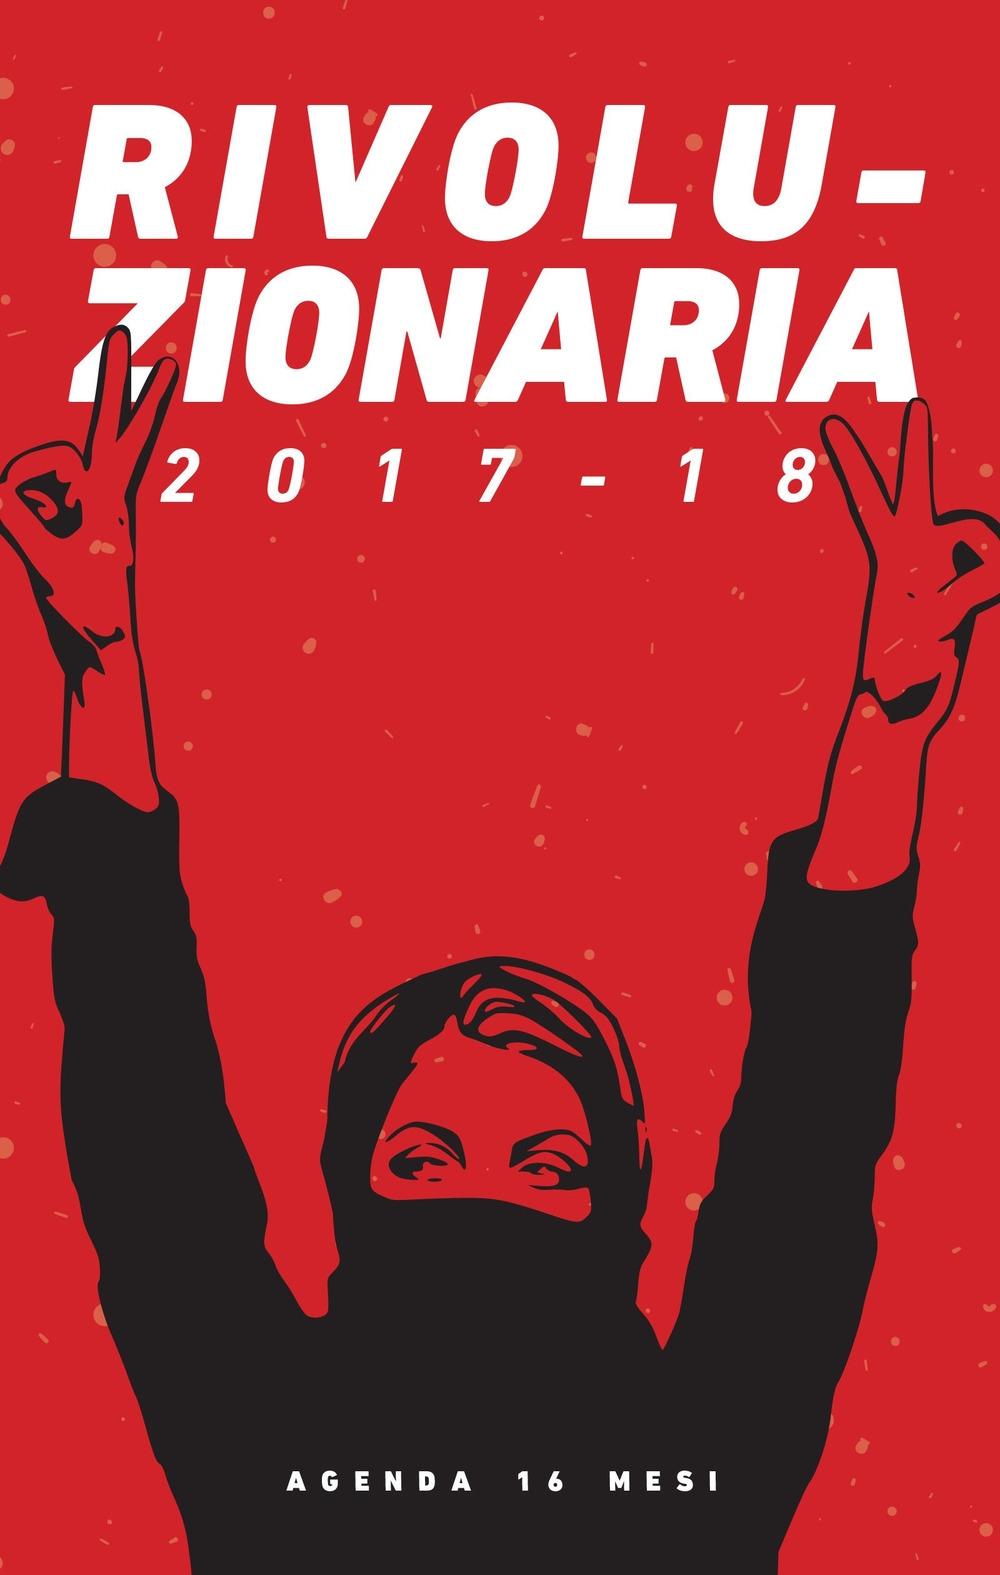 Rivoluzionaria. Agenda 12 mesi